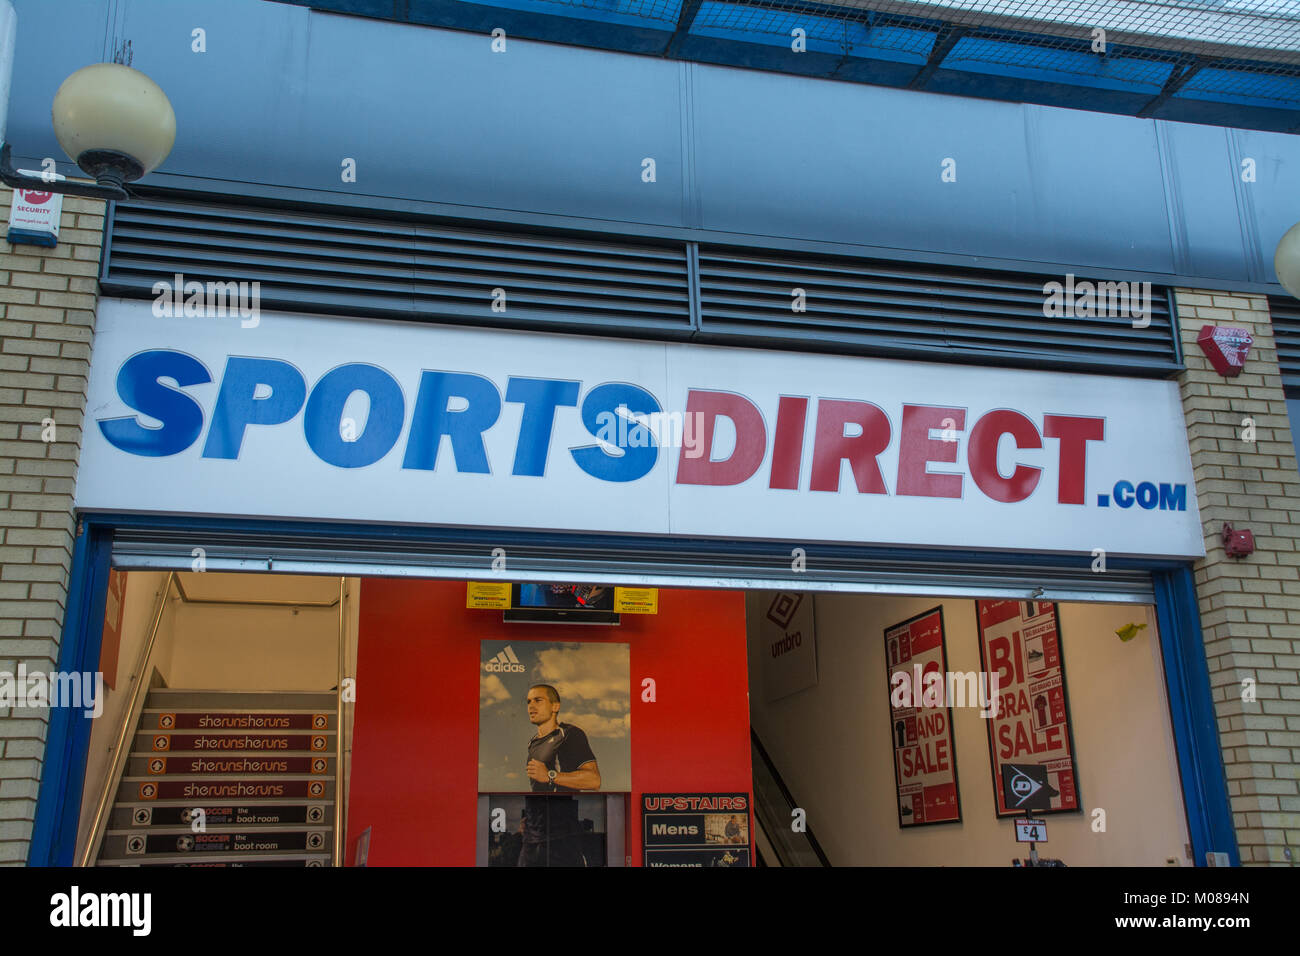 sports direct uk stock photos sports direct uk stock images alamy. Black Bedroom Furniture Sets. Home Design Ideas